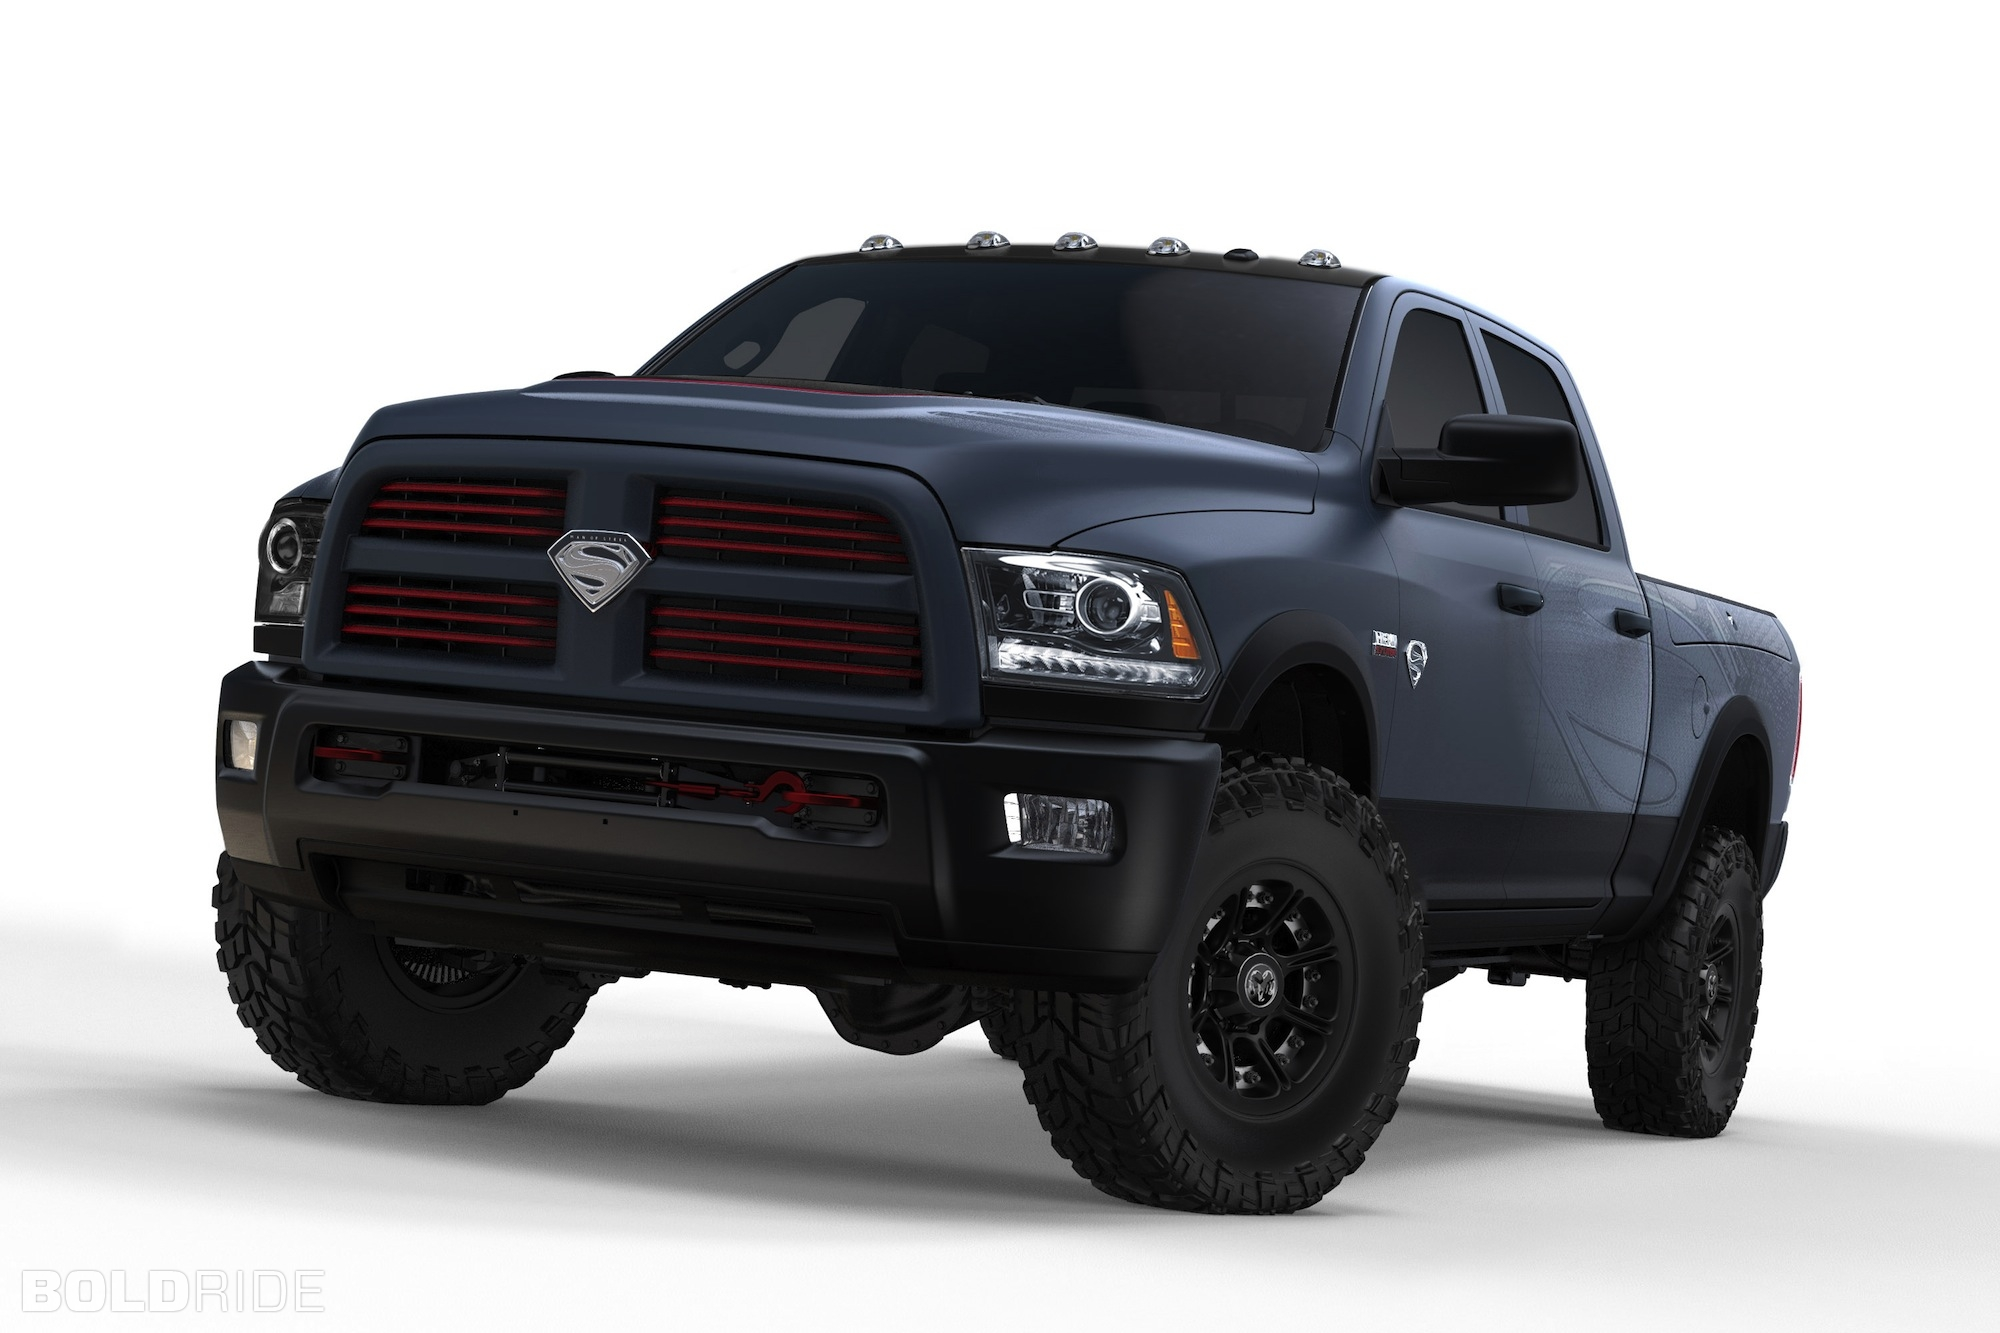 2013 Ram Power Wagon offroad 4x4 truck wallpaper 2000x1333 2000x1333